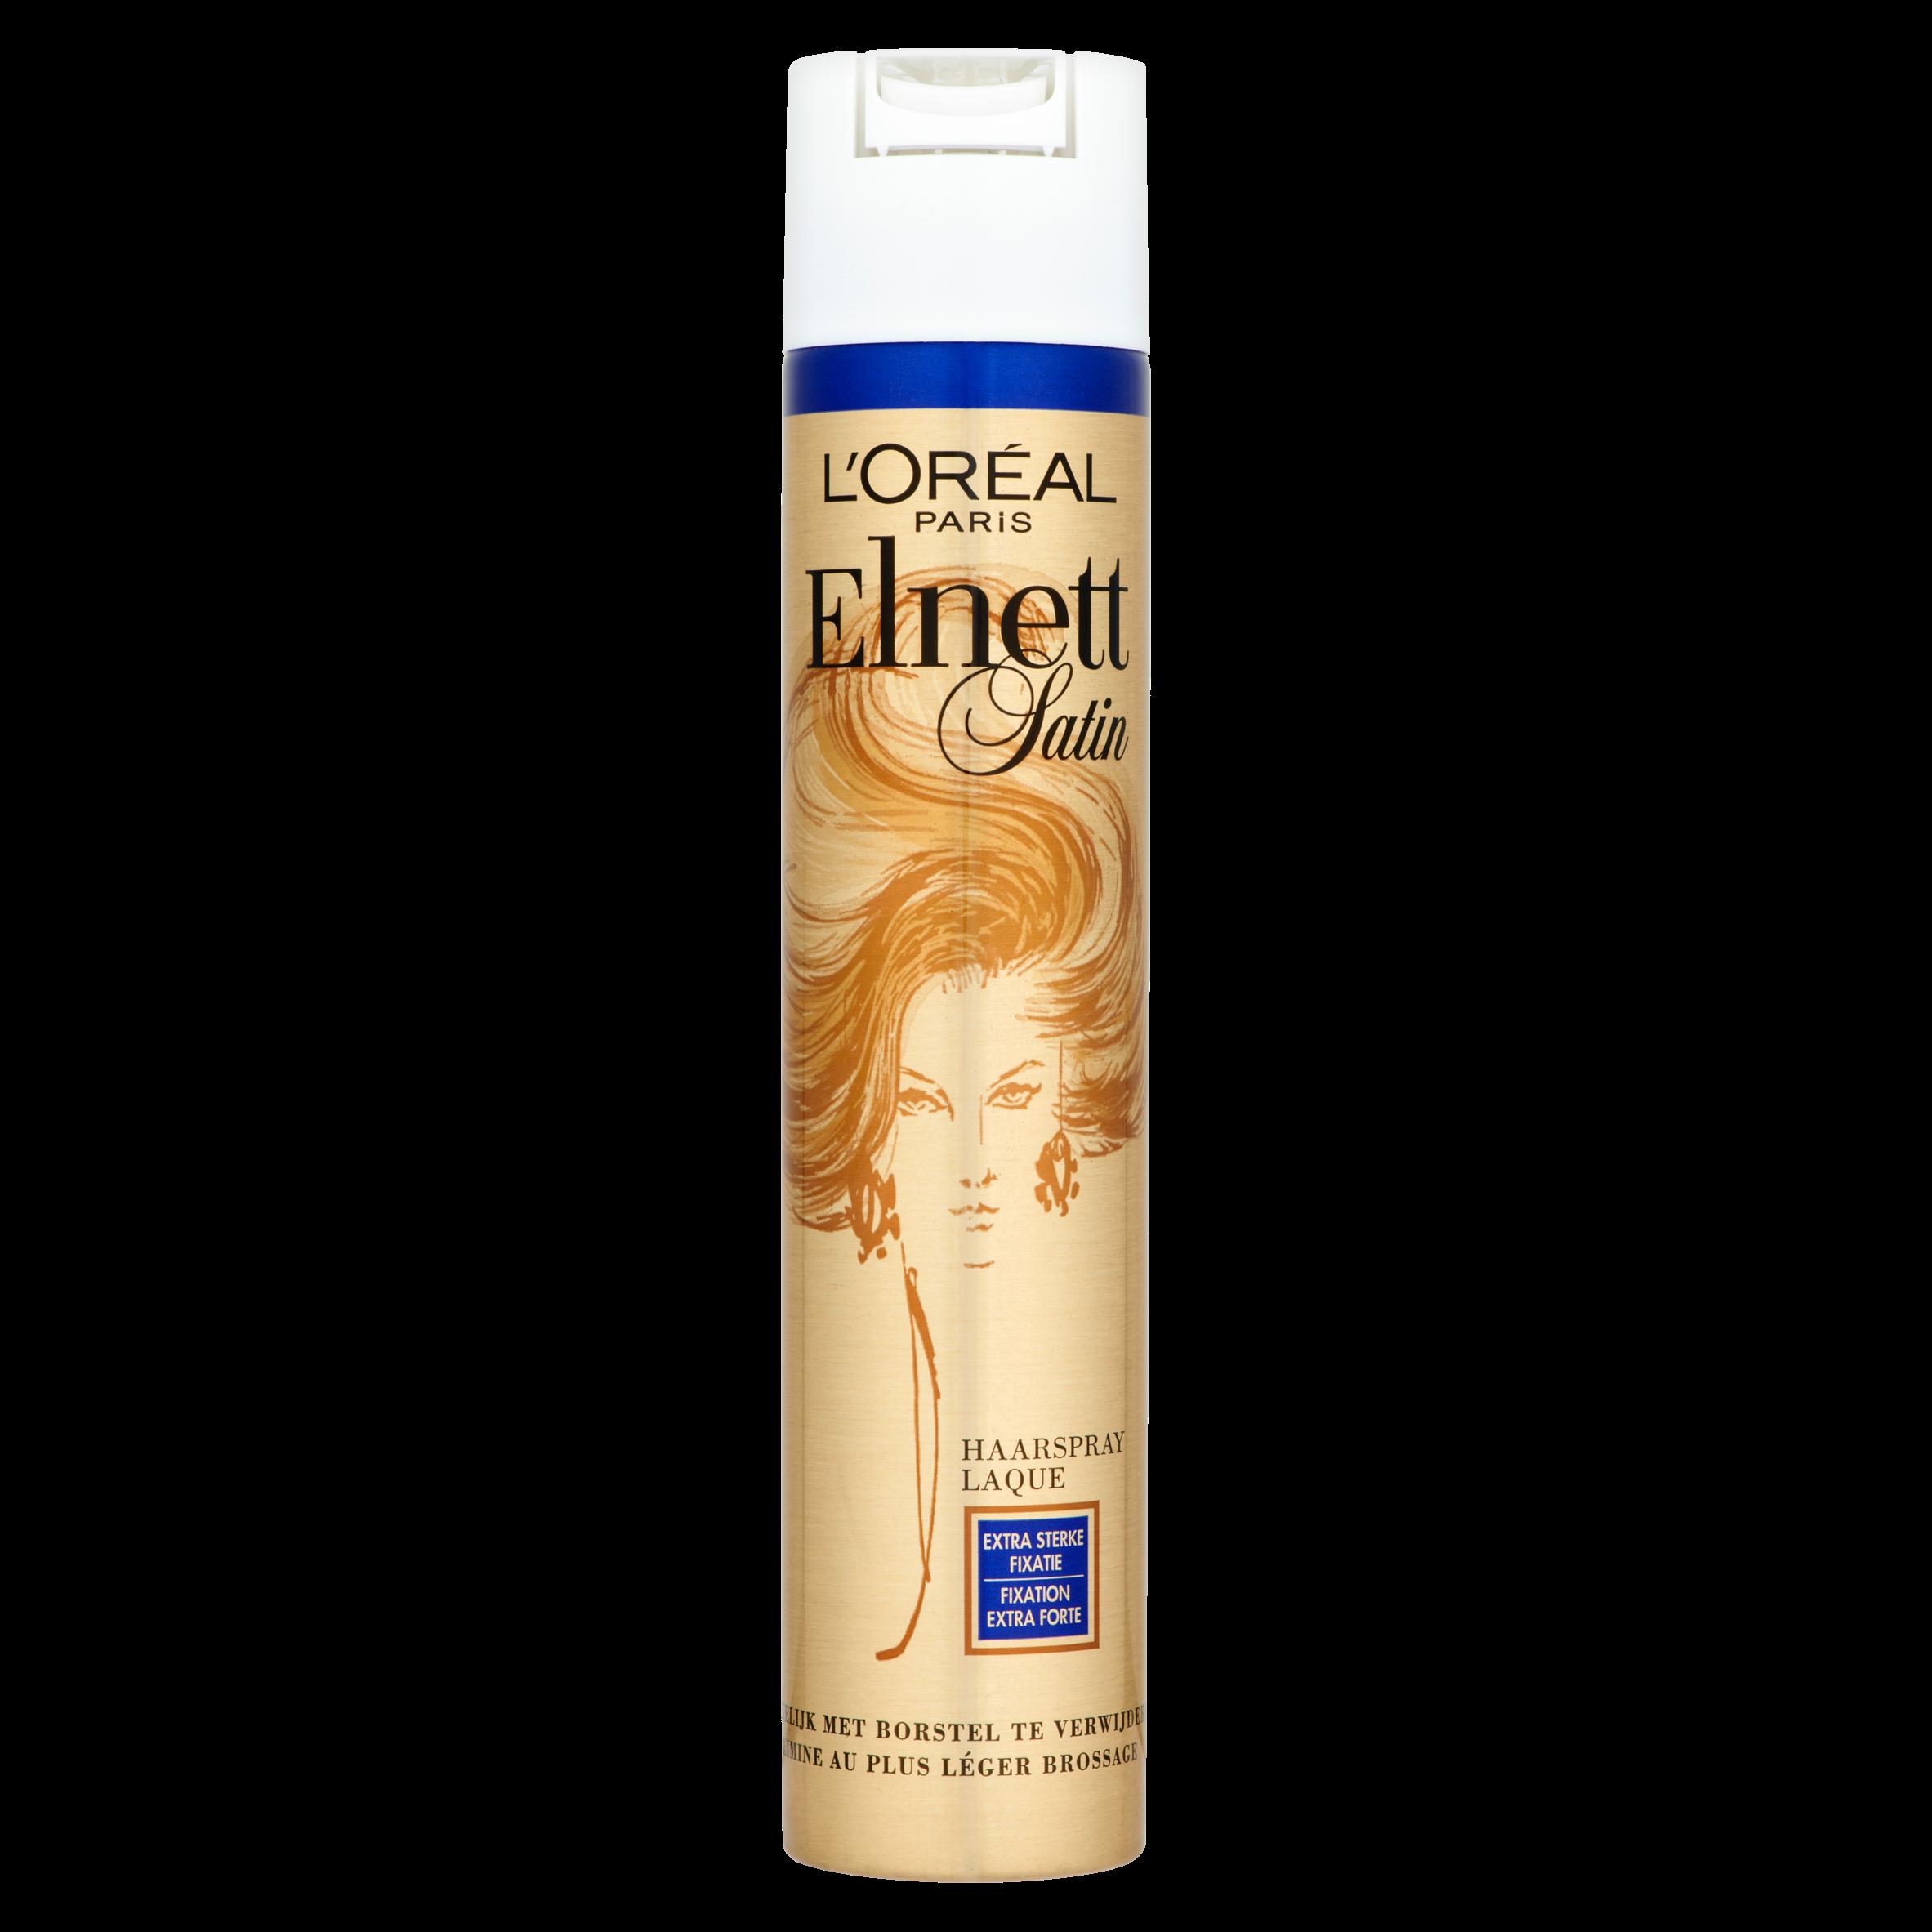 L'Oréal Paris Elnett Satin Haarspray Extra Sterke Fixatie 300 ml